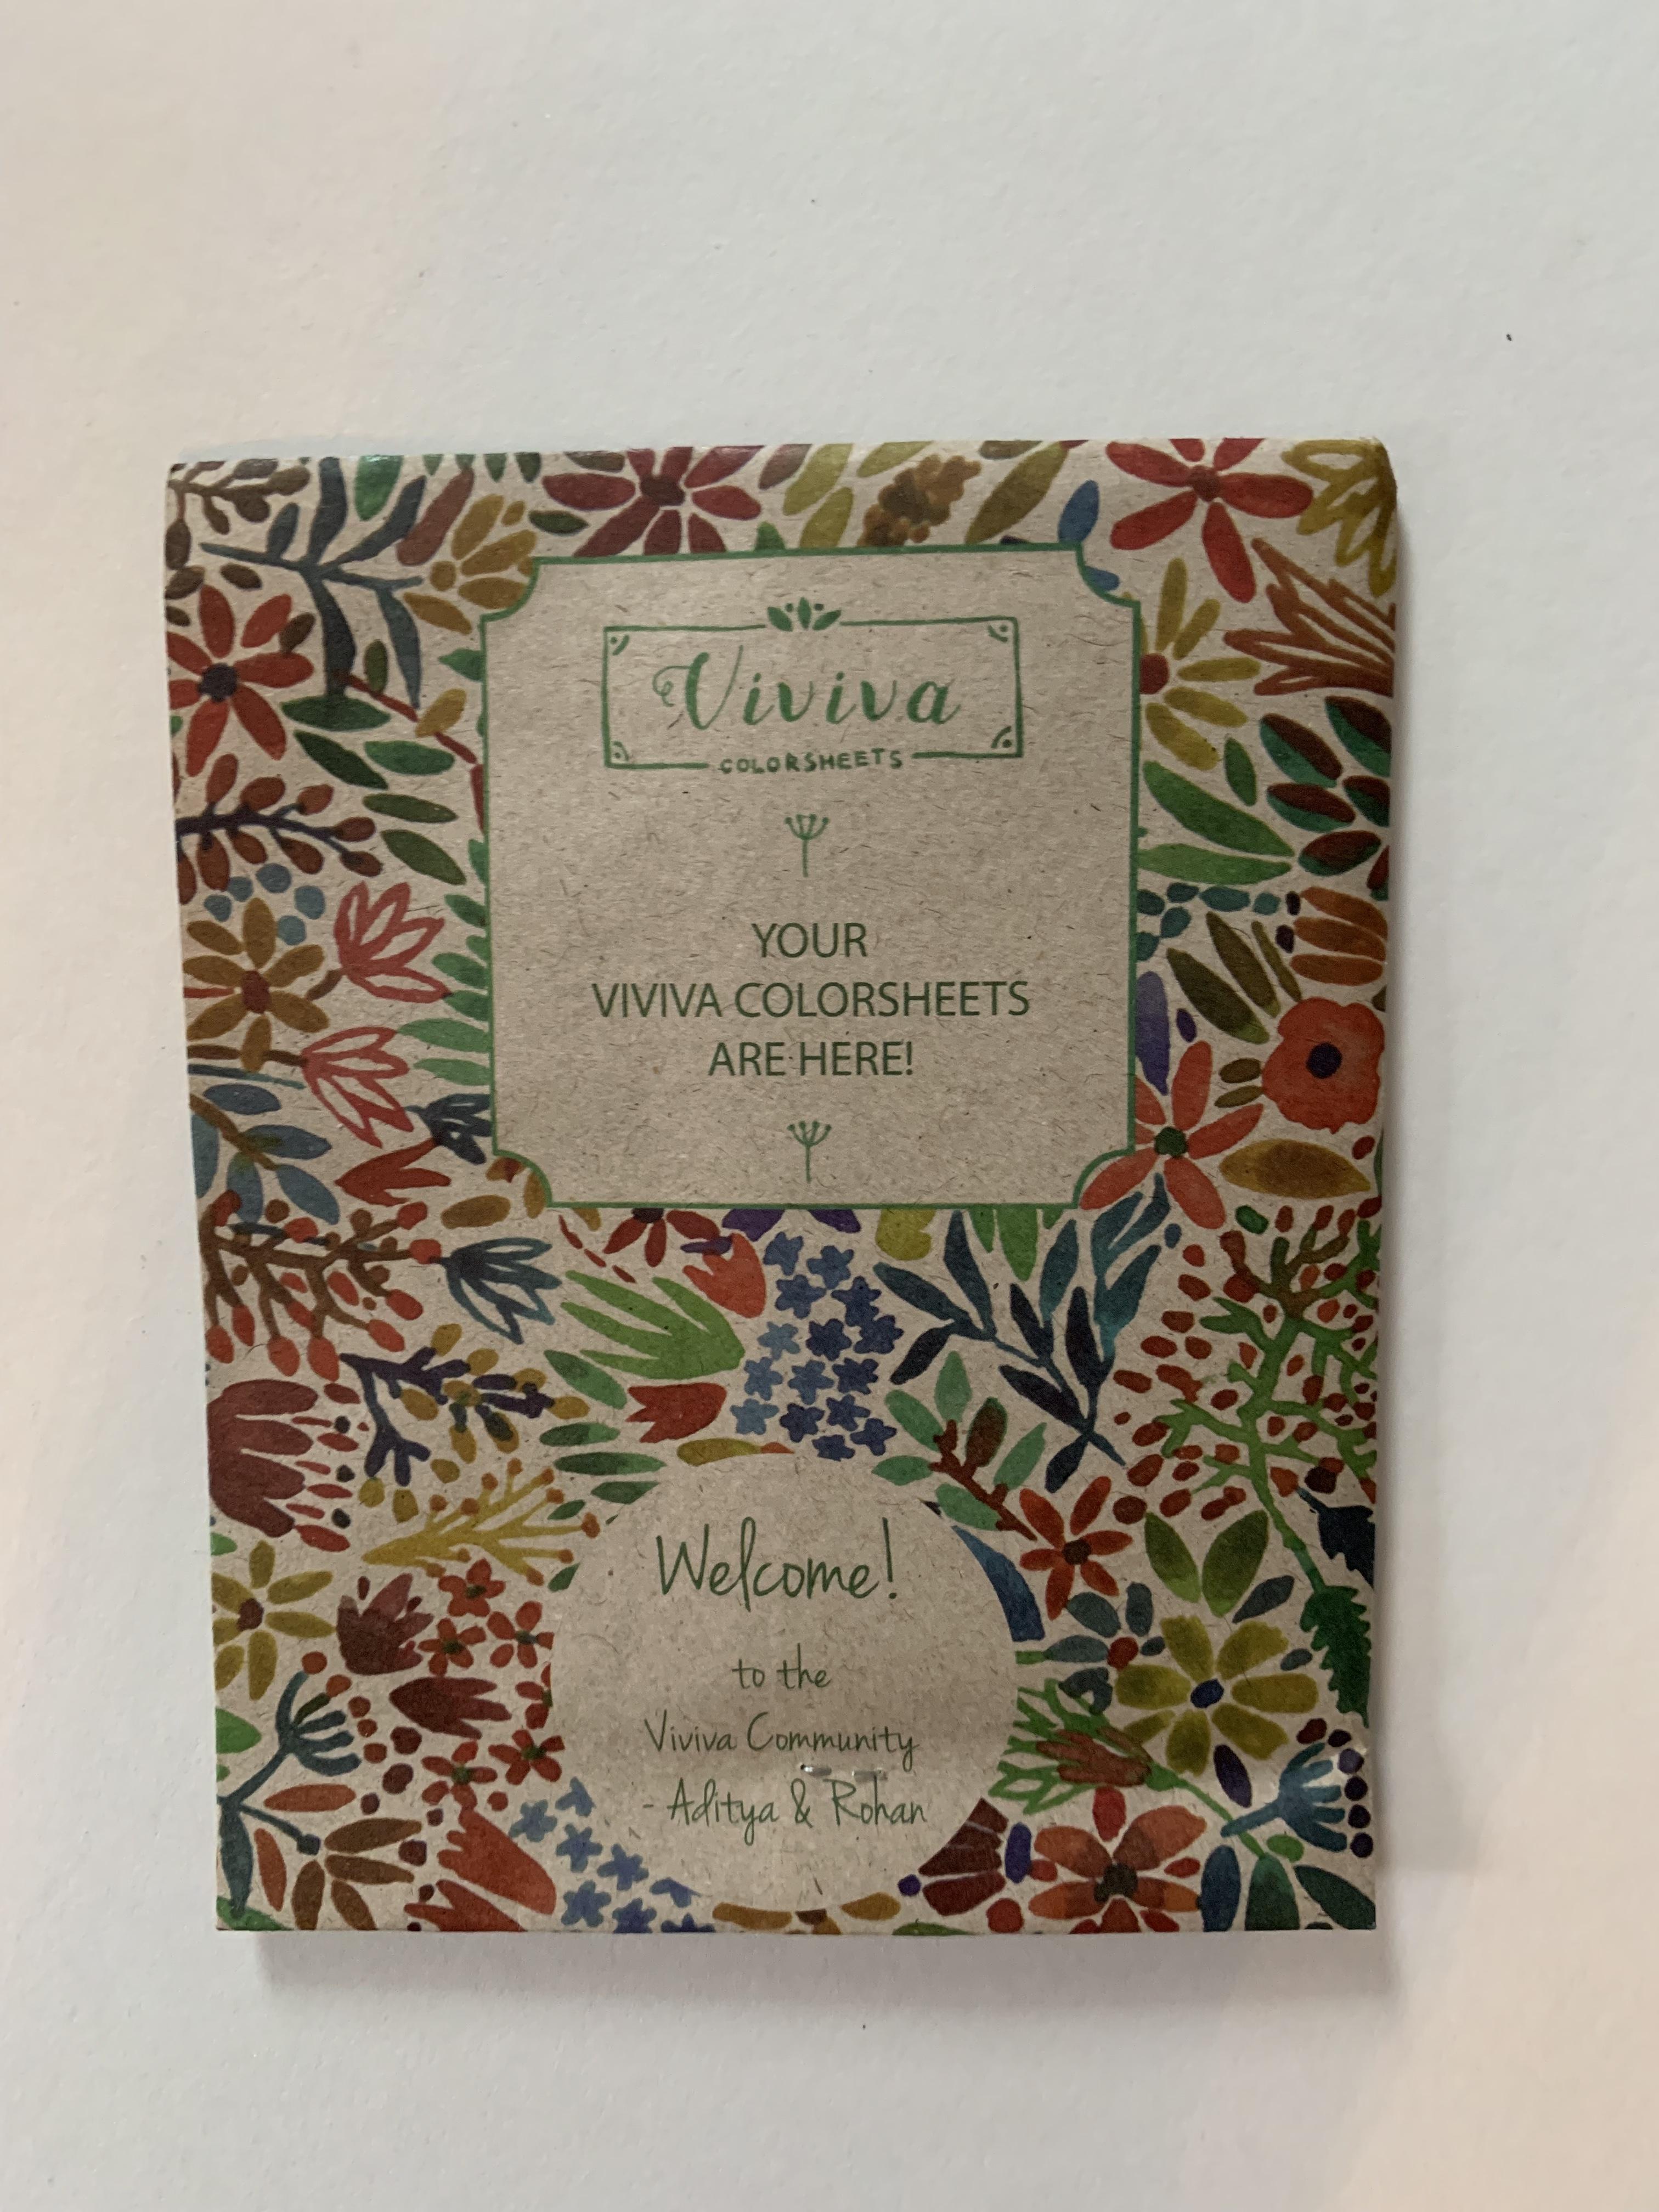 Viviva Color Sheets Xanadu Art Studio Online Store Powered By